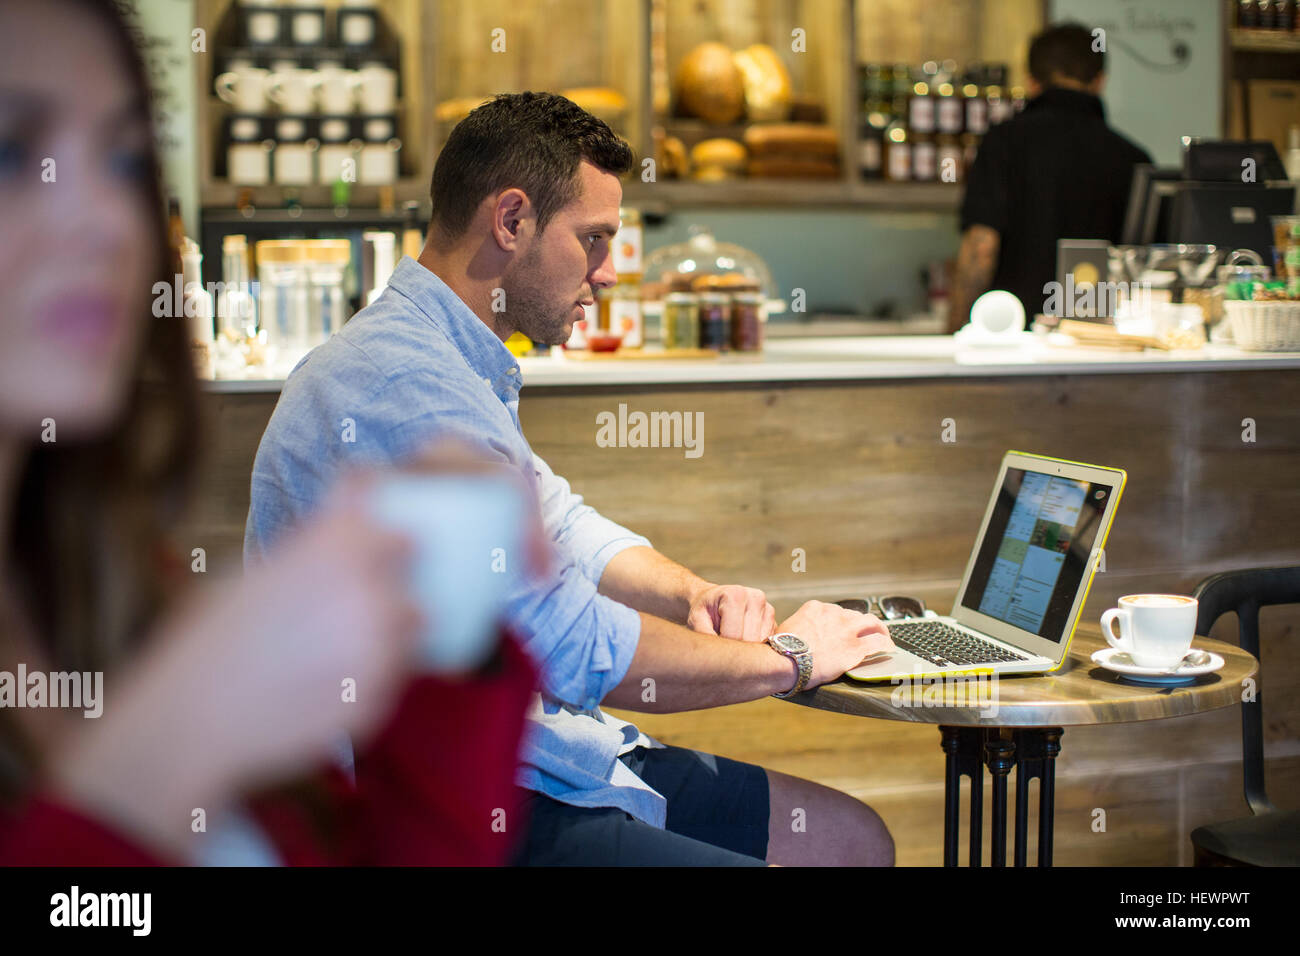 Man sitting in cafe reading laptop - Stock Image